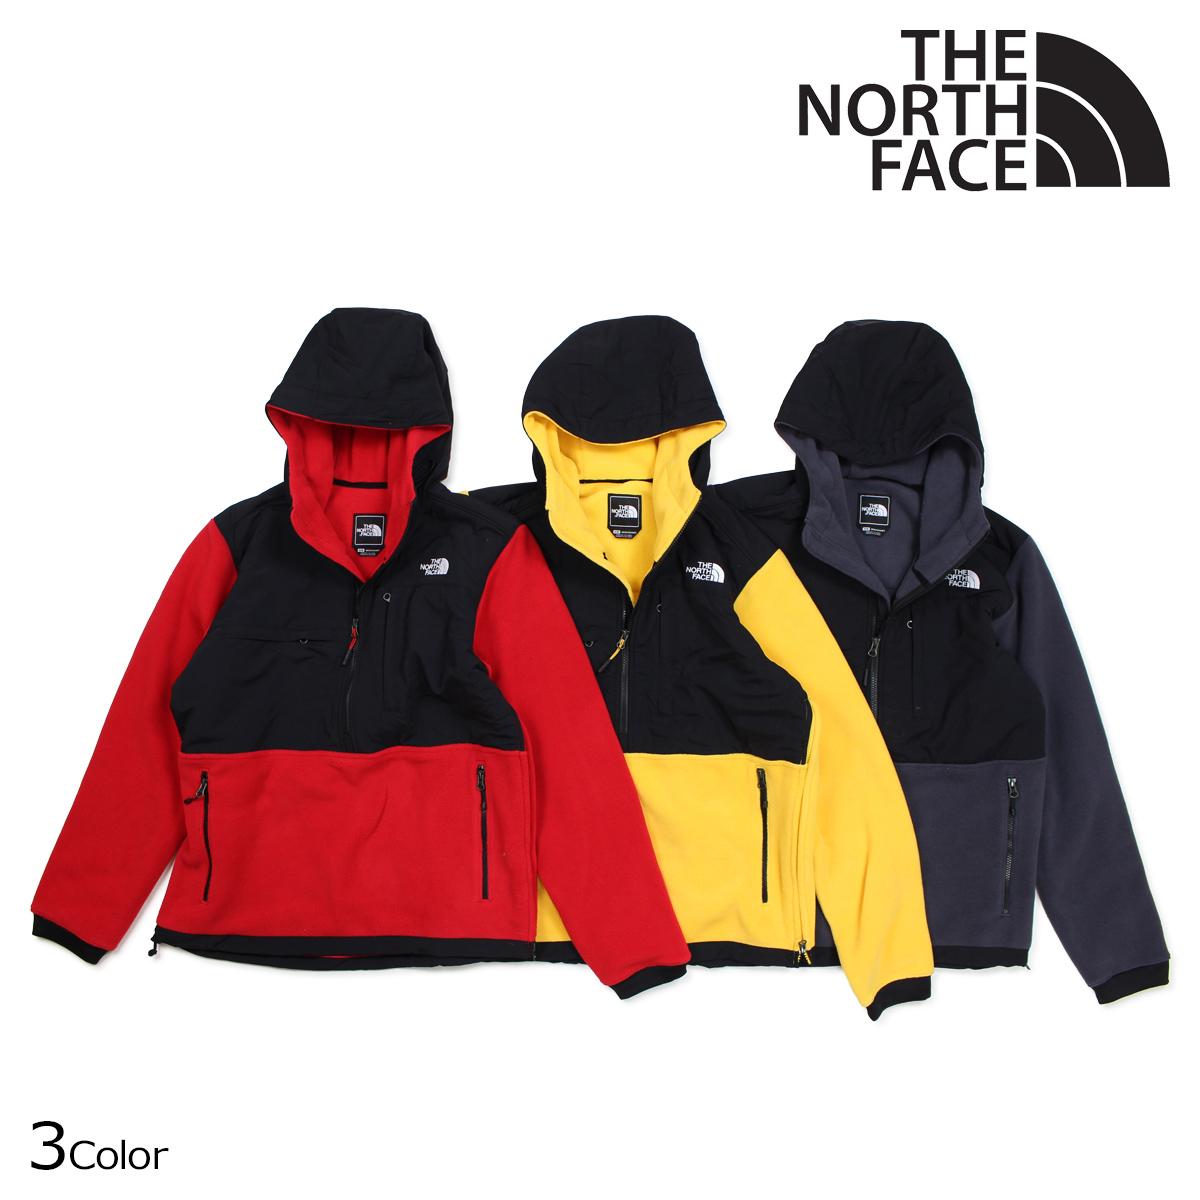 THE NORTH FACE ノースフェイス ジャケット デナリ アナラク マウンテンジャケット メンズ MENS DENALI ANORAK NF0A3MMT [10/9 新入荷]